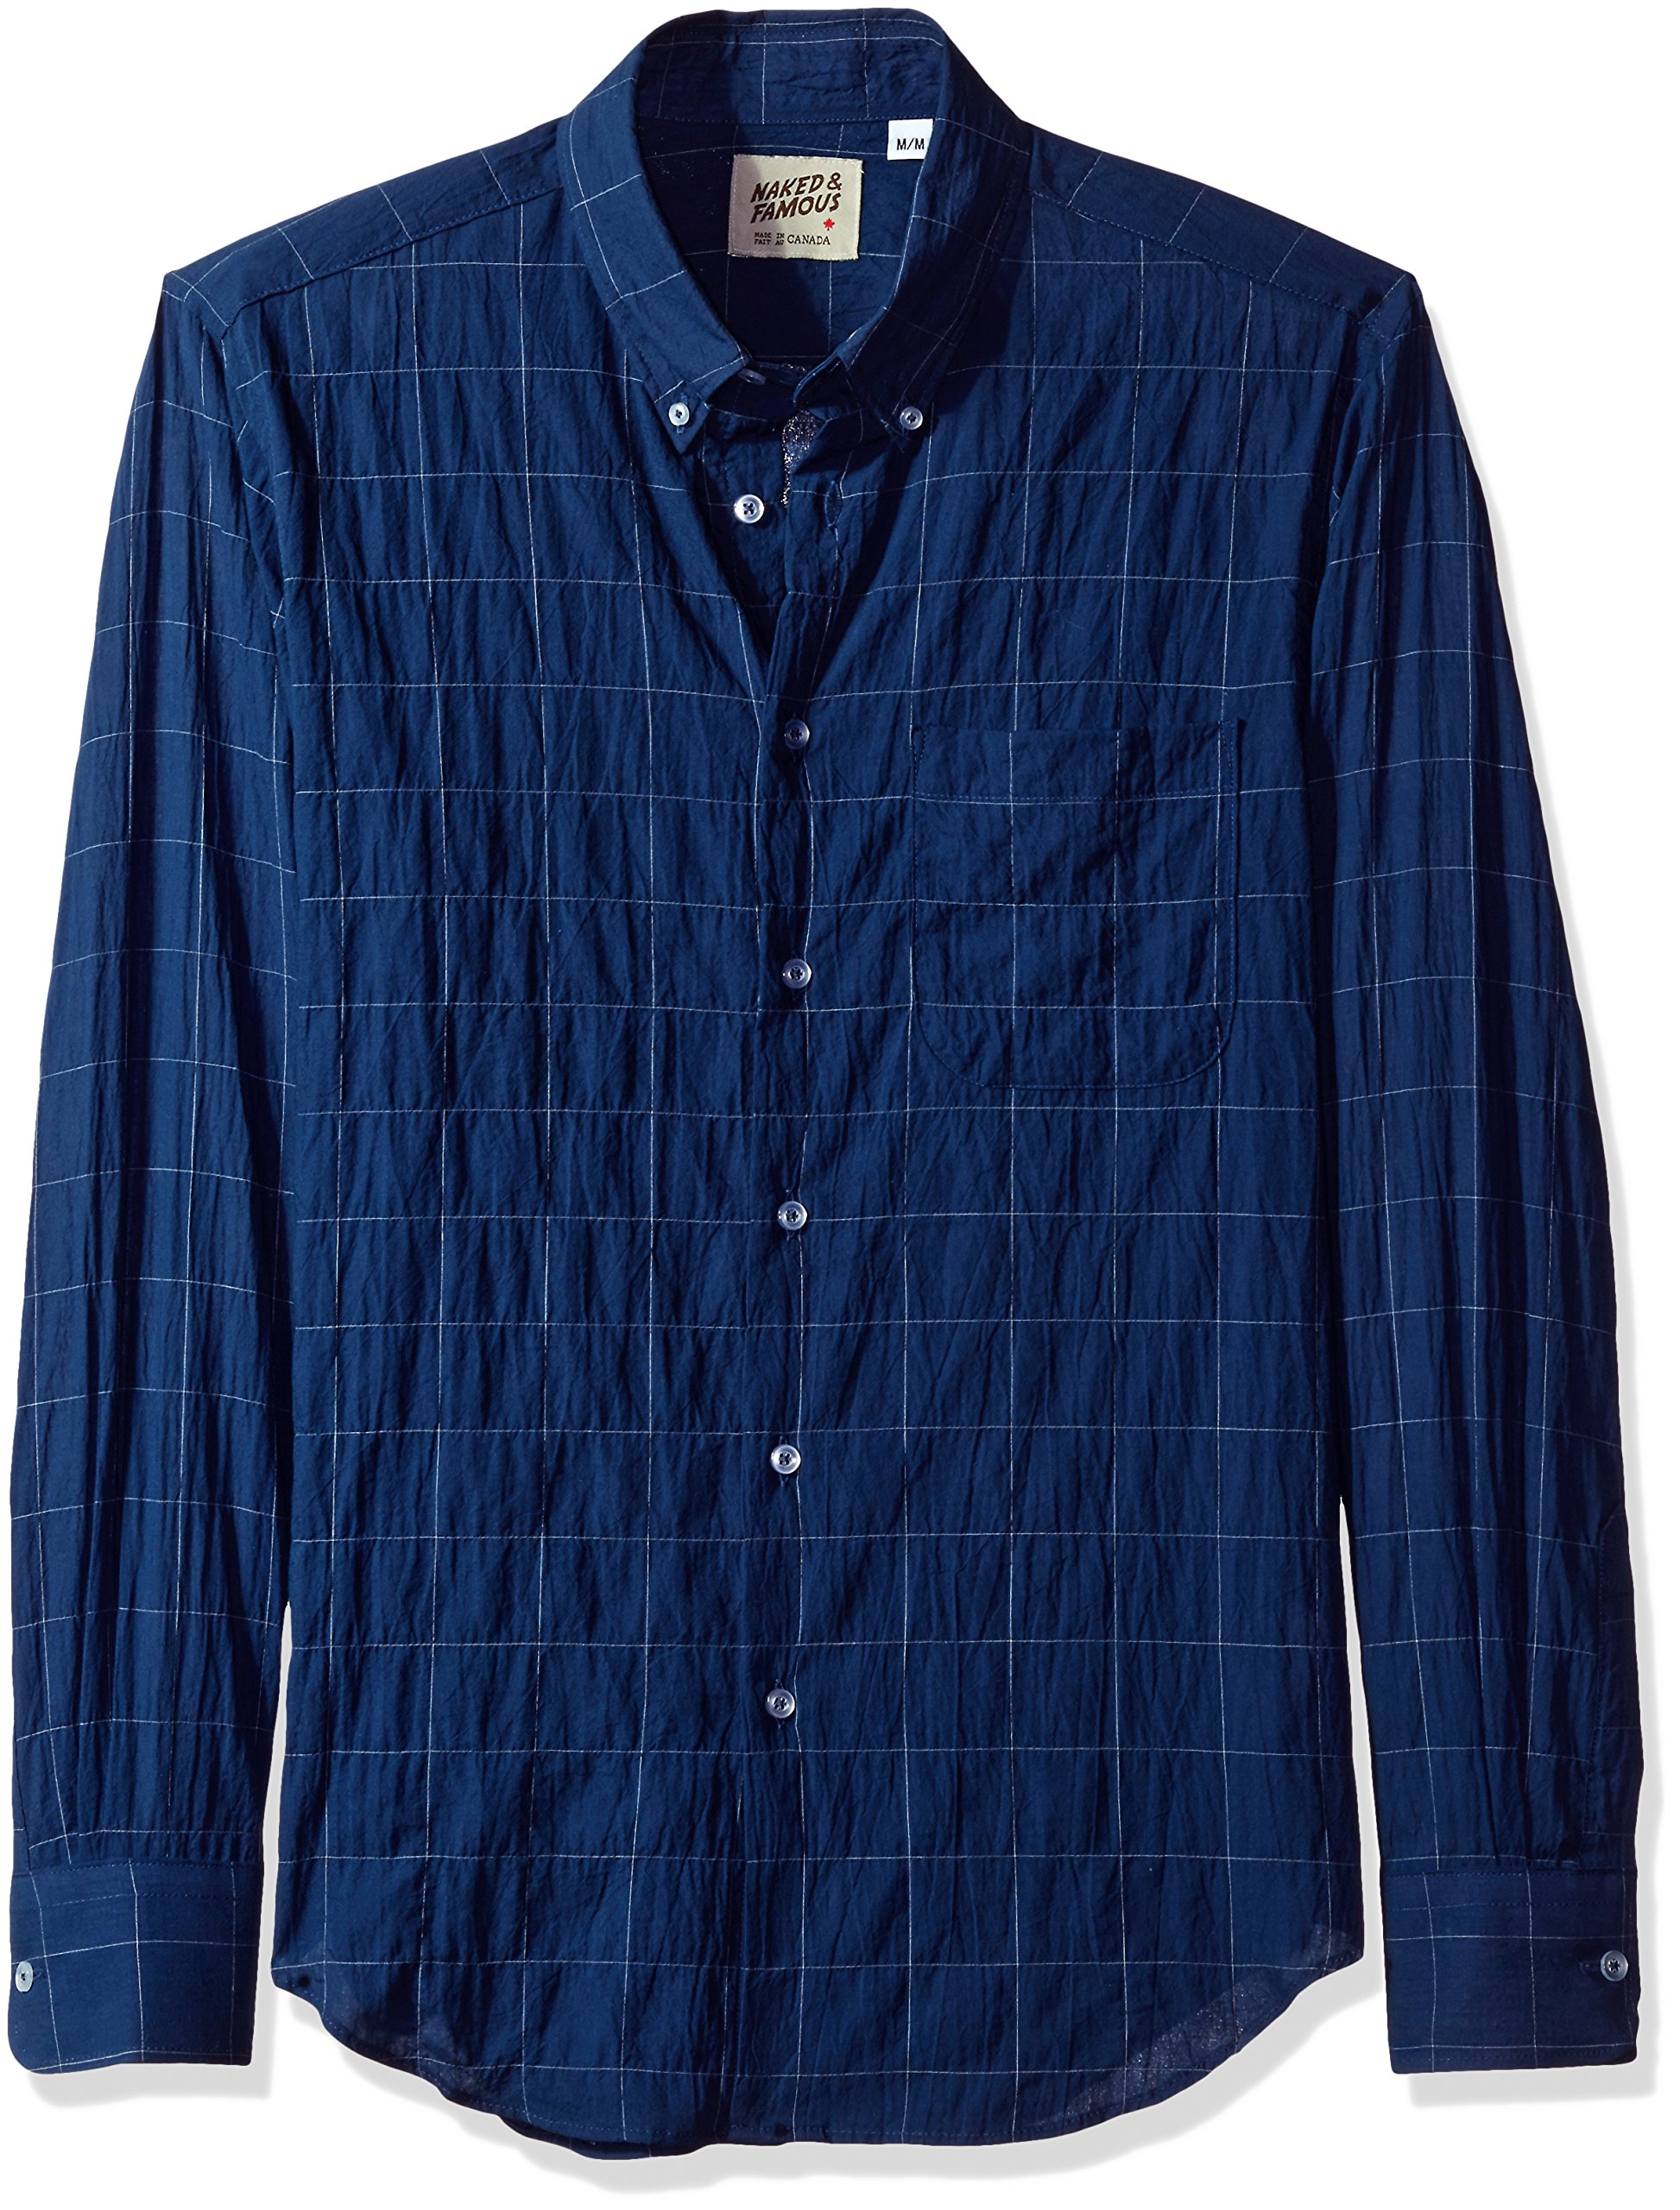 Naked & Famous Denim Men's Lightweight Windowpane Long Sleeve Button Down Shirt, Navy, Large